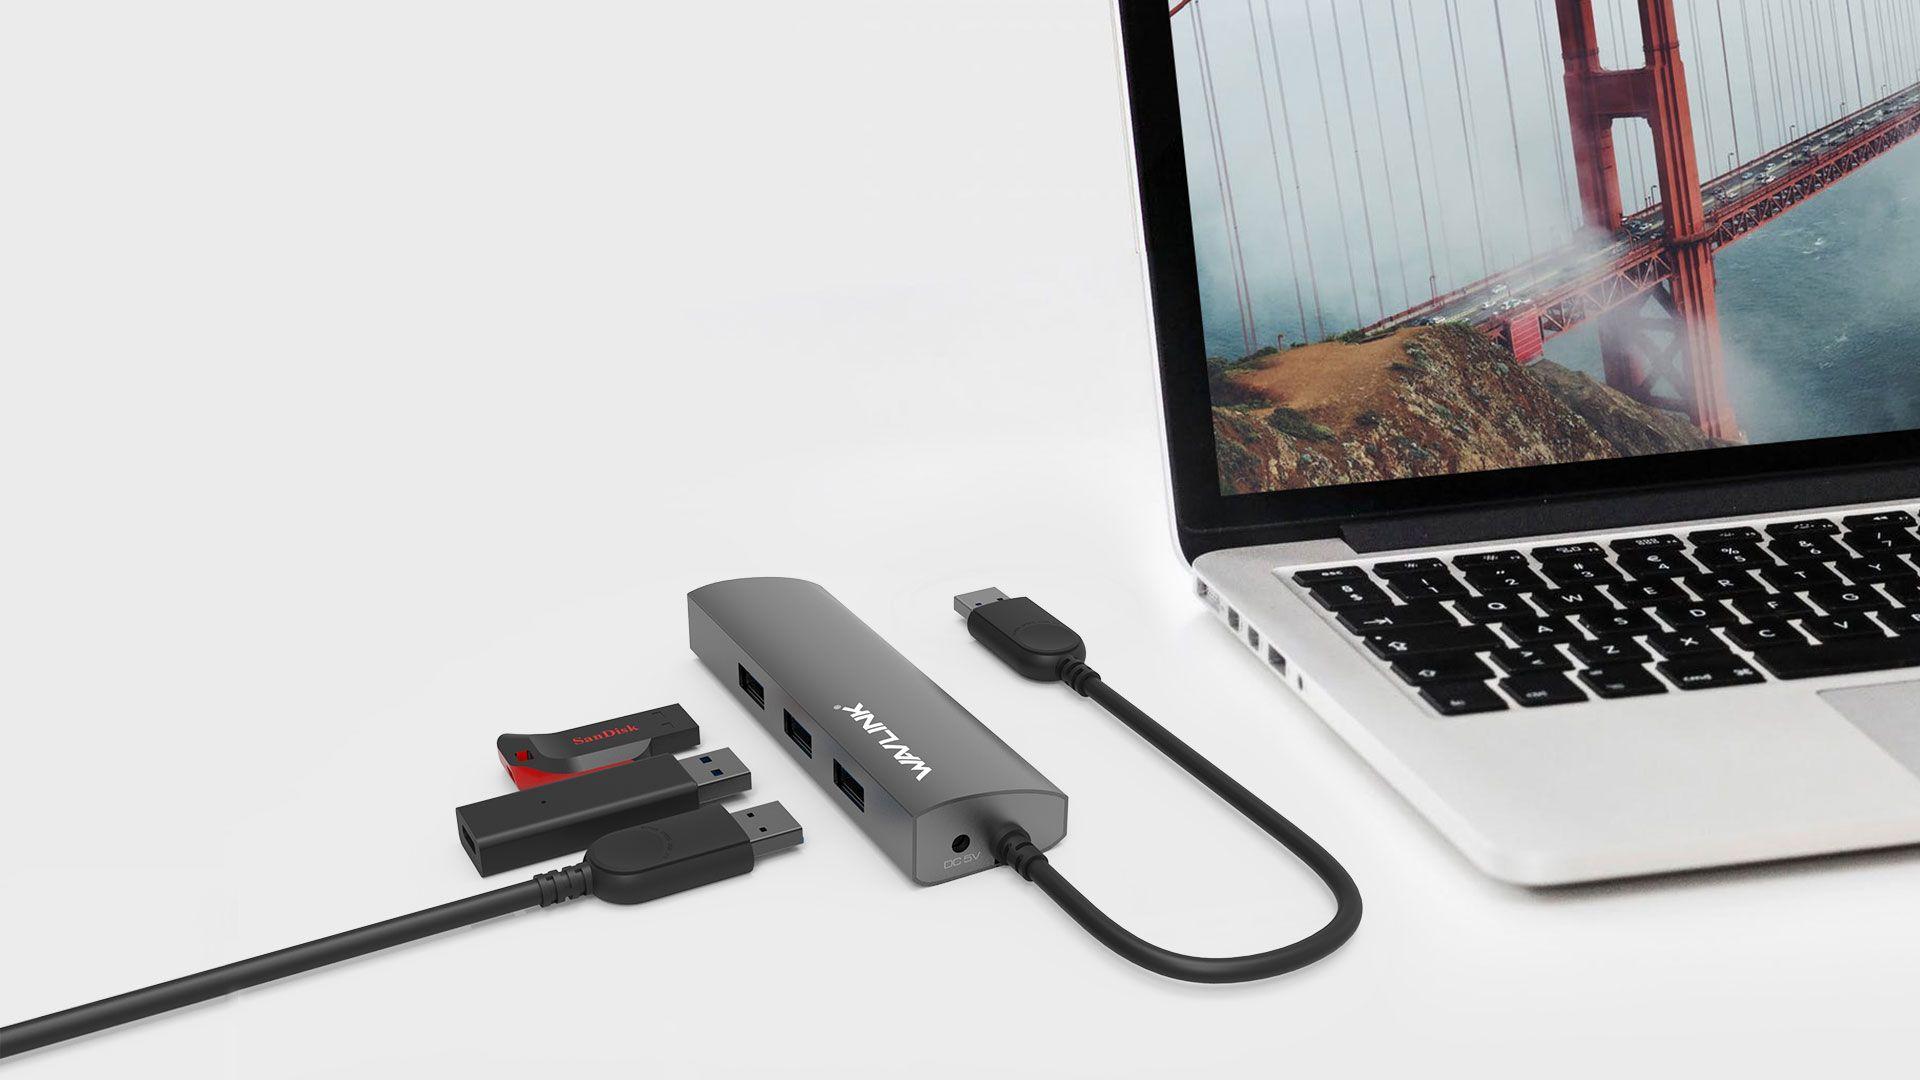 WAVLINK USB 3.0 4-PORT HUB WITH GIGABIT ETHERNET 6 9